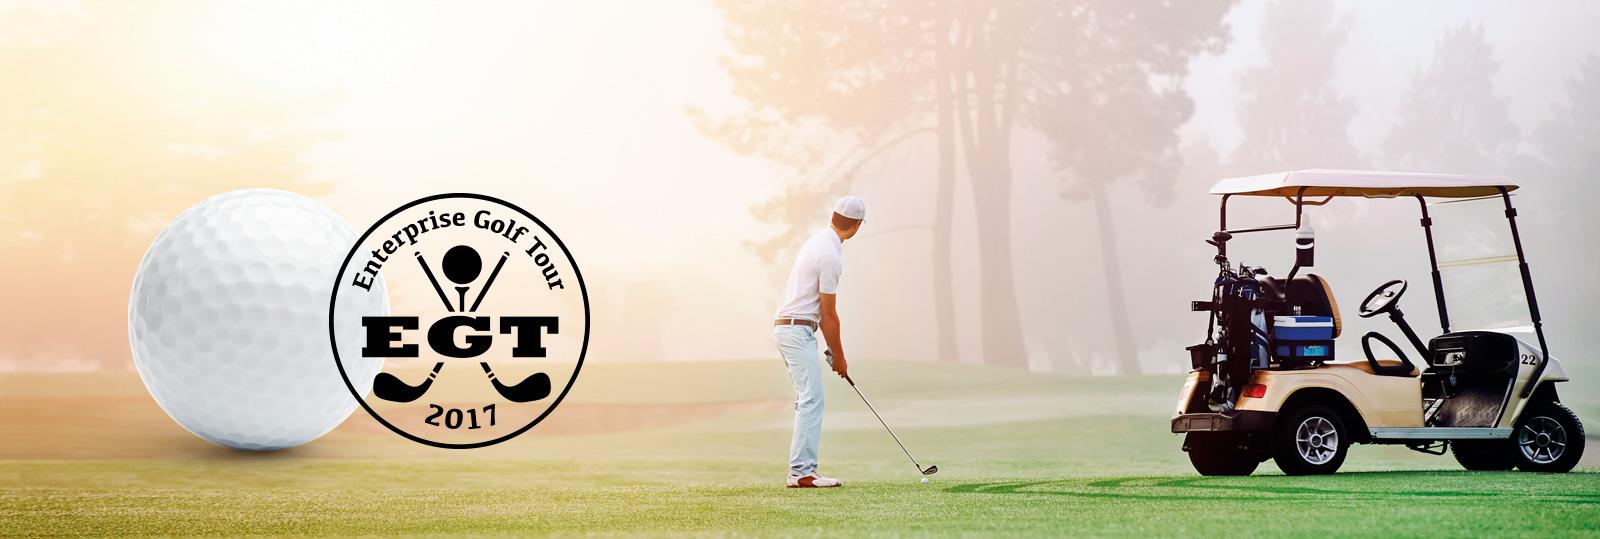 HEAD-web-golf-EGT-2017_02